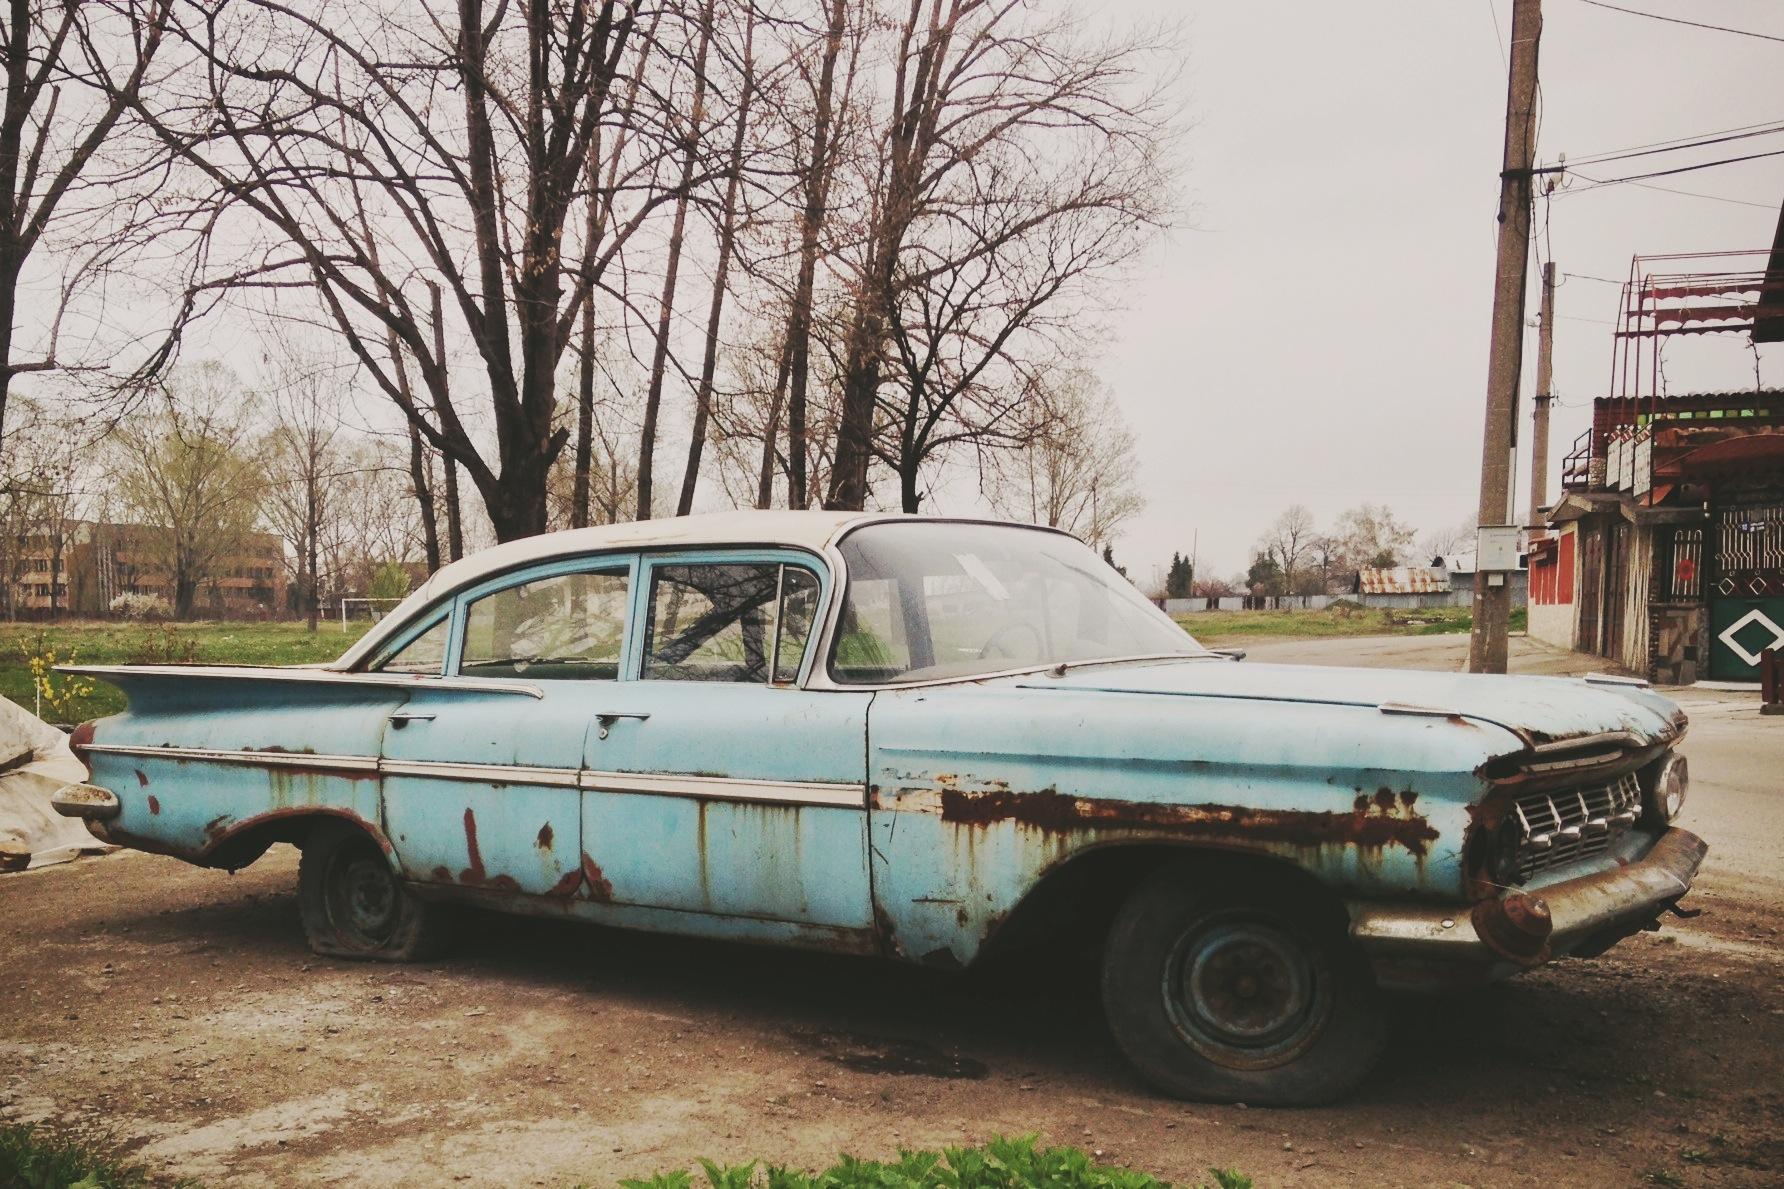 Wallpaper : old, abandoned, vintage, iPhone, Bulgaria